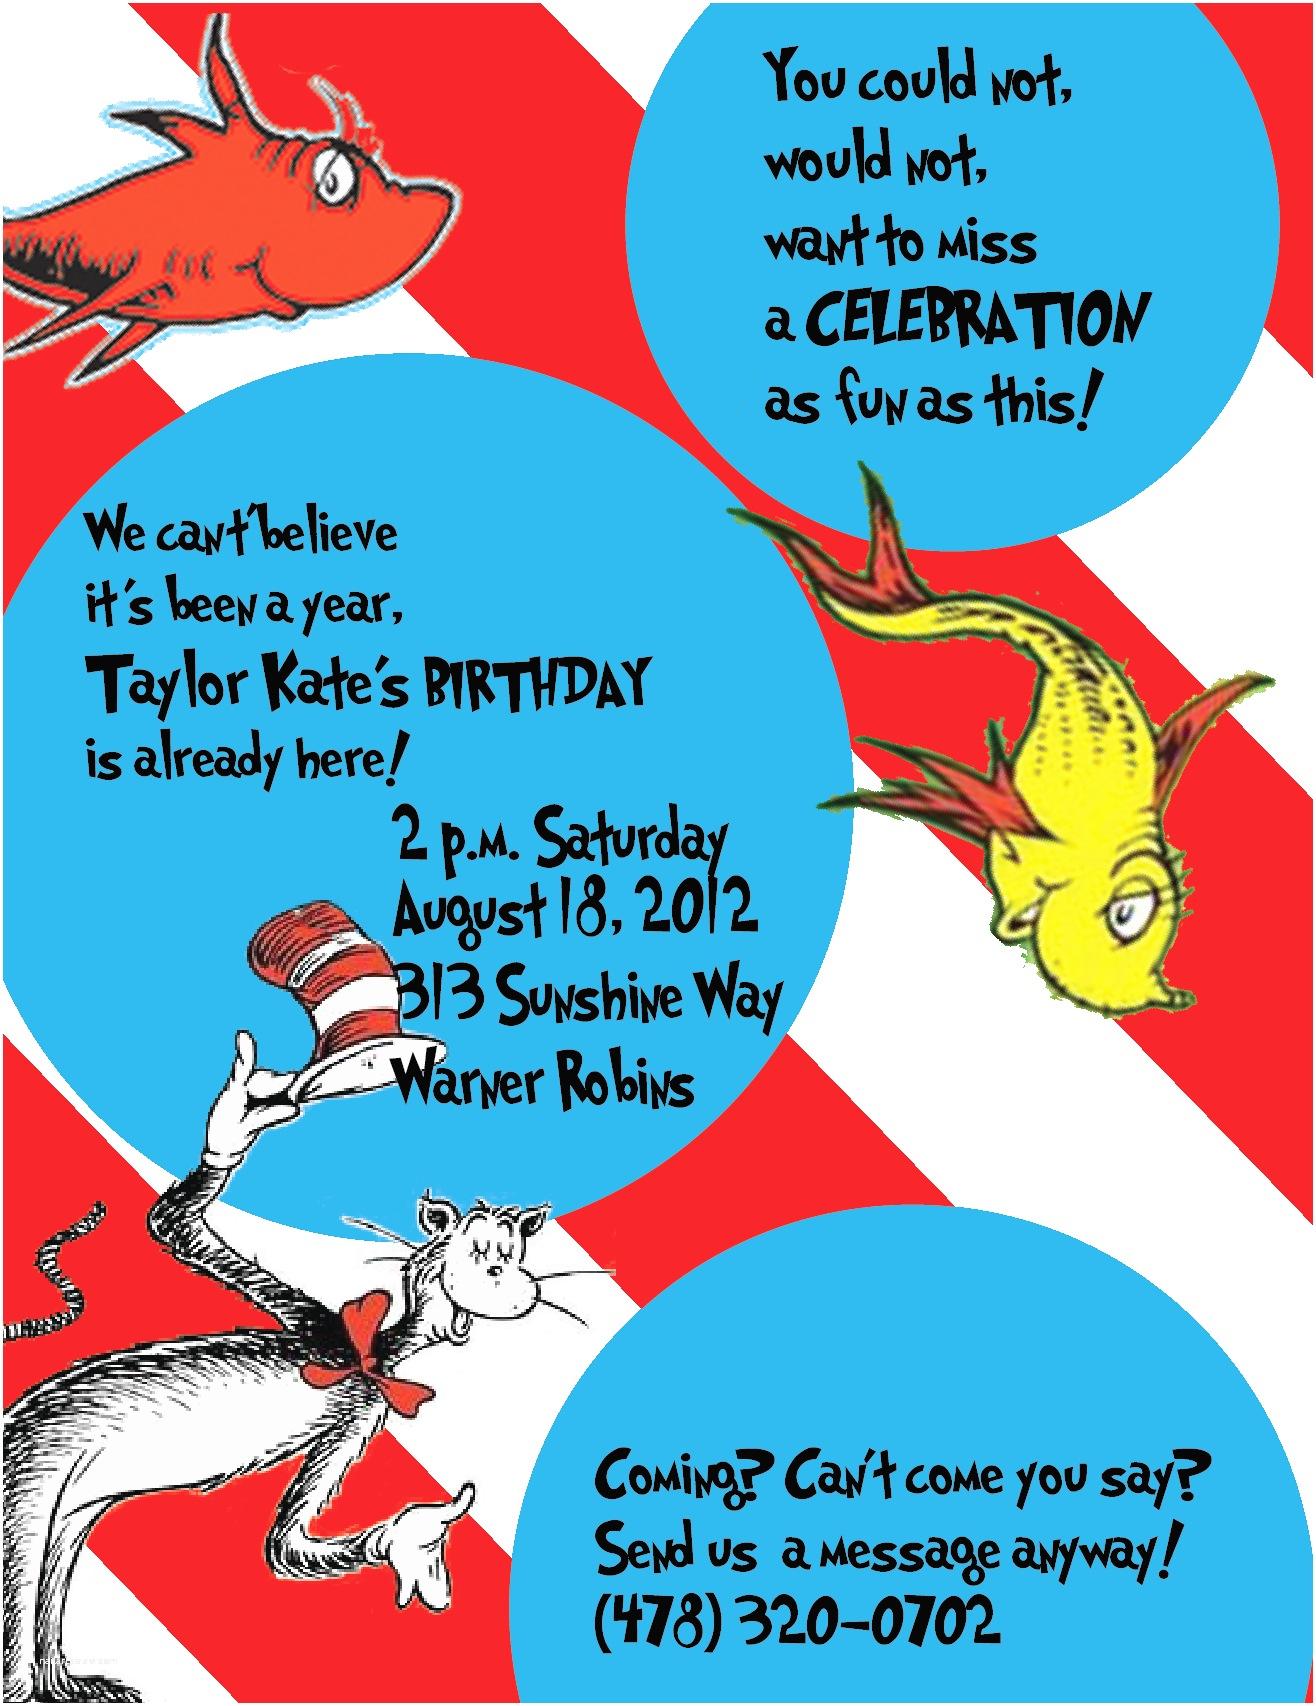 Cat In the Hat Birthday Invitations Cat In the Hat Birthday Party Invitations